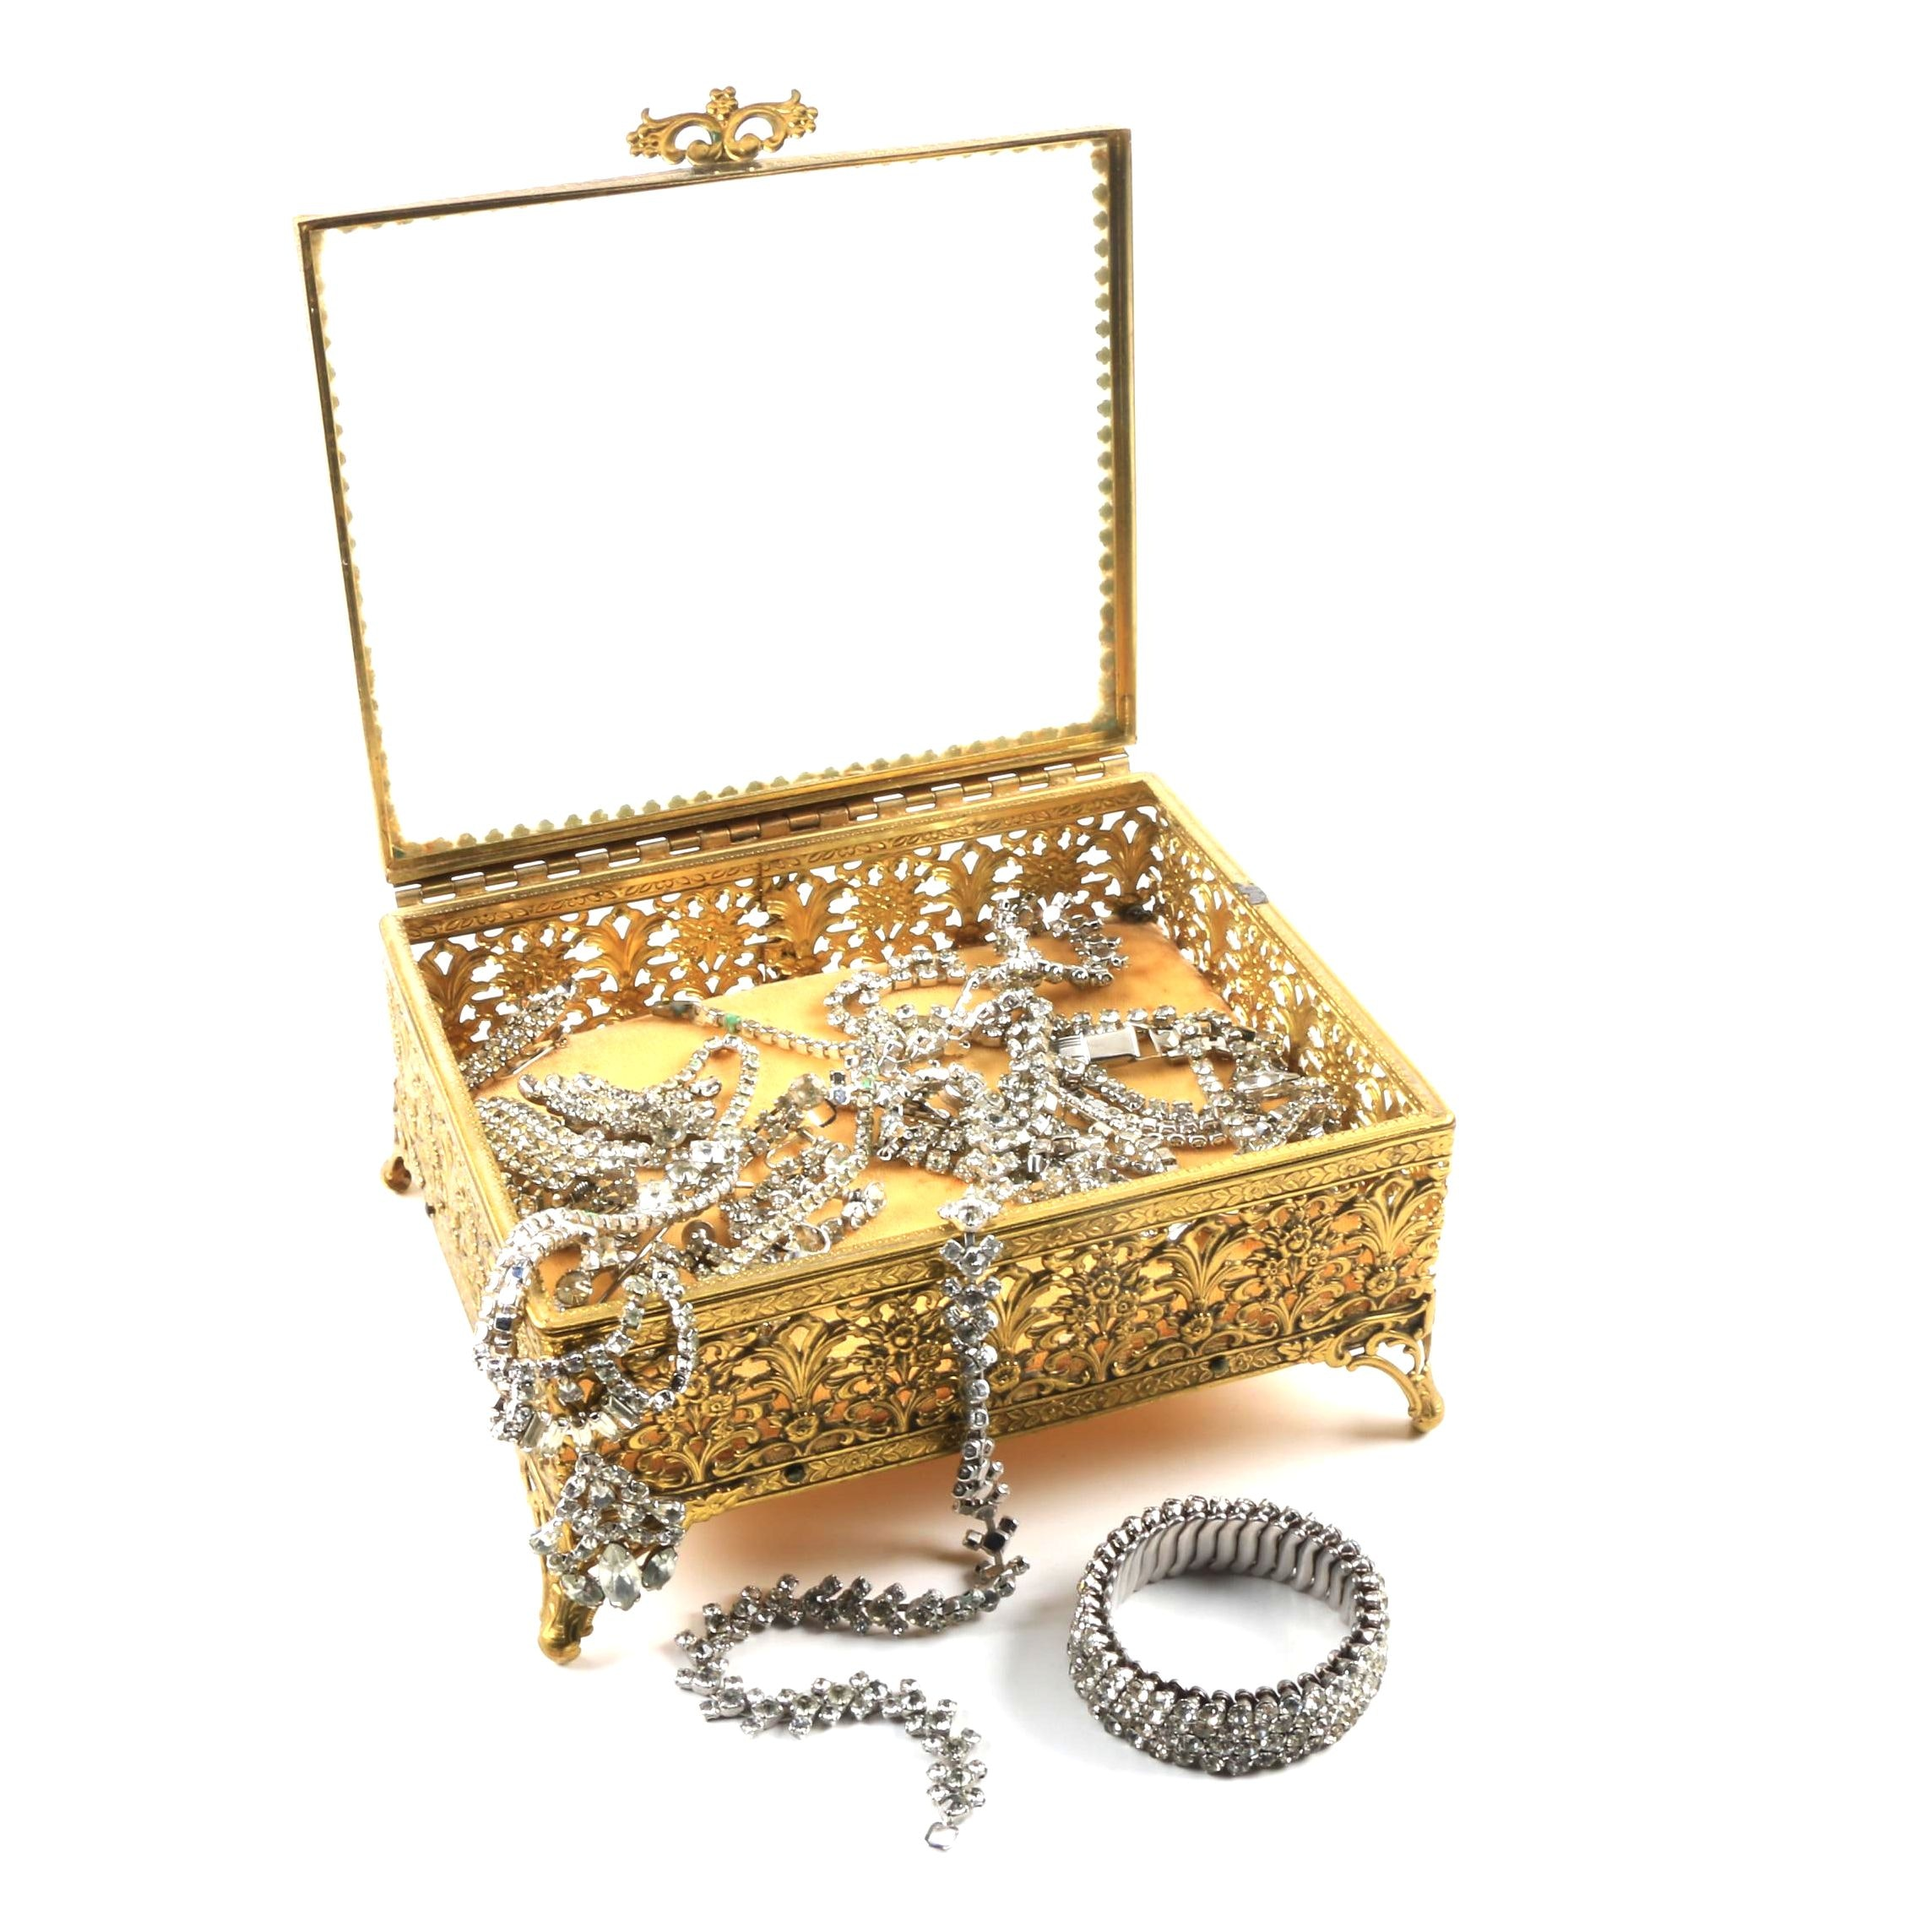 Vintage Rhinestone Jewelry in Glass Top Jewelry Box